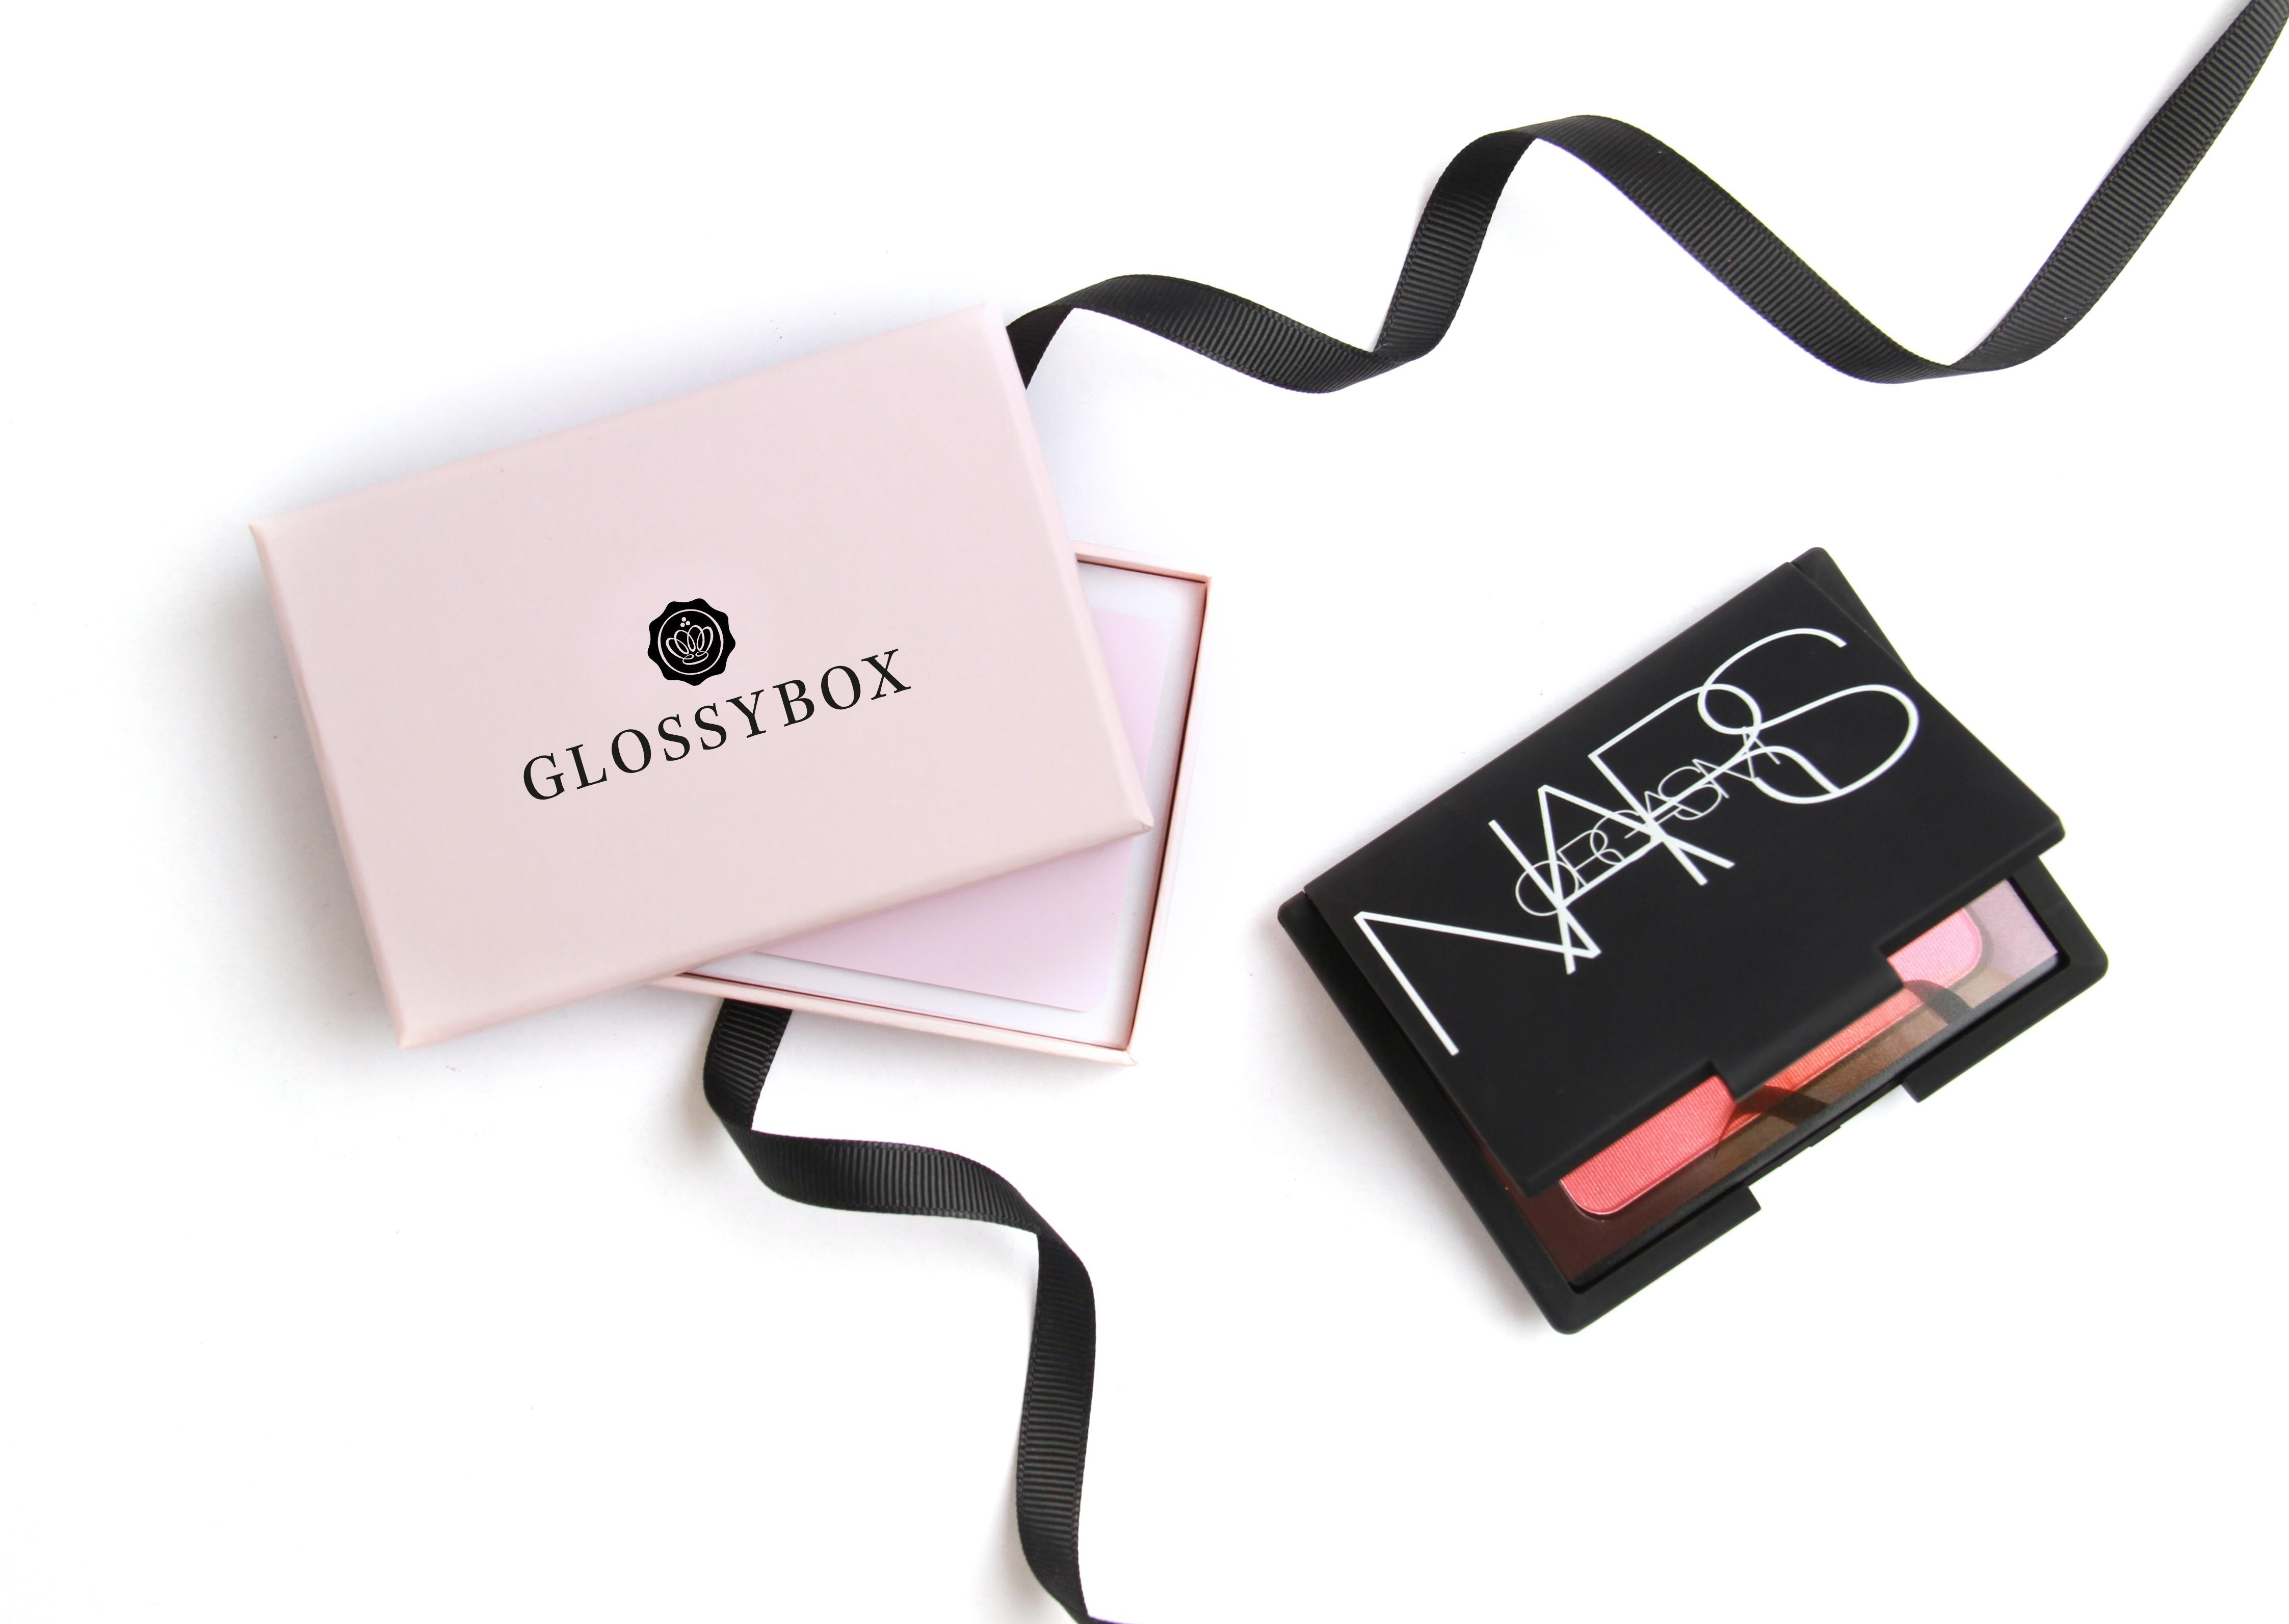 glossybox-gift-card-nars-2